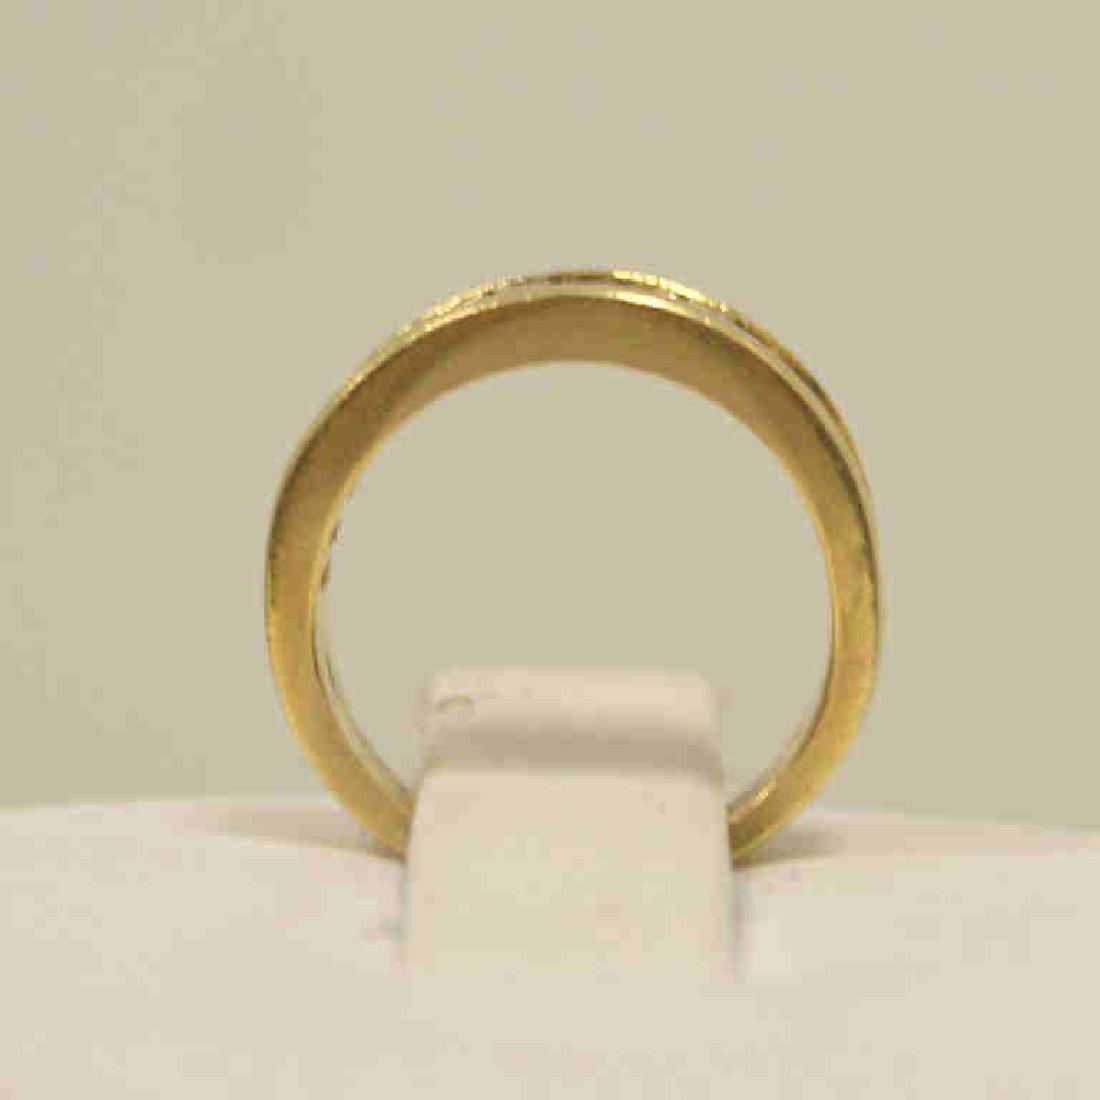 14kt yellow gold diamond wedding band - 4